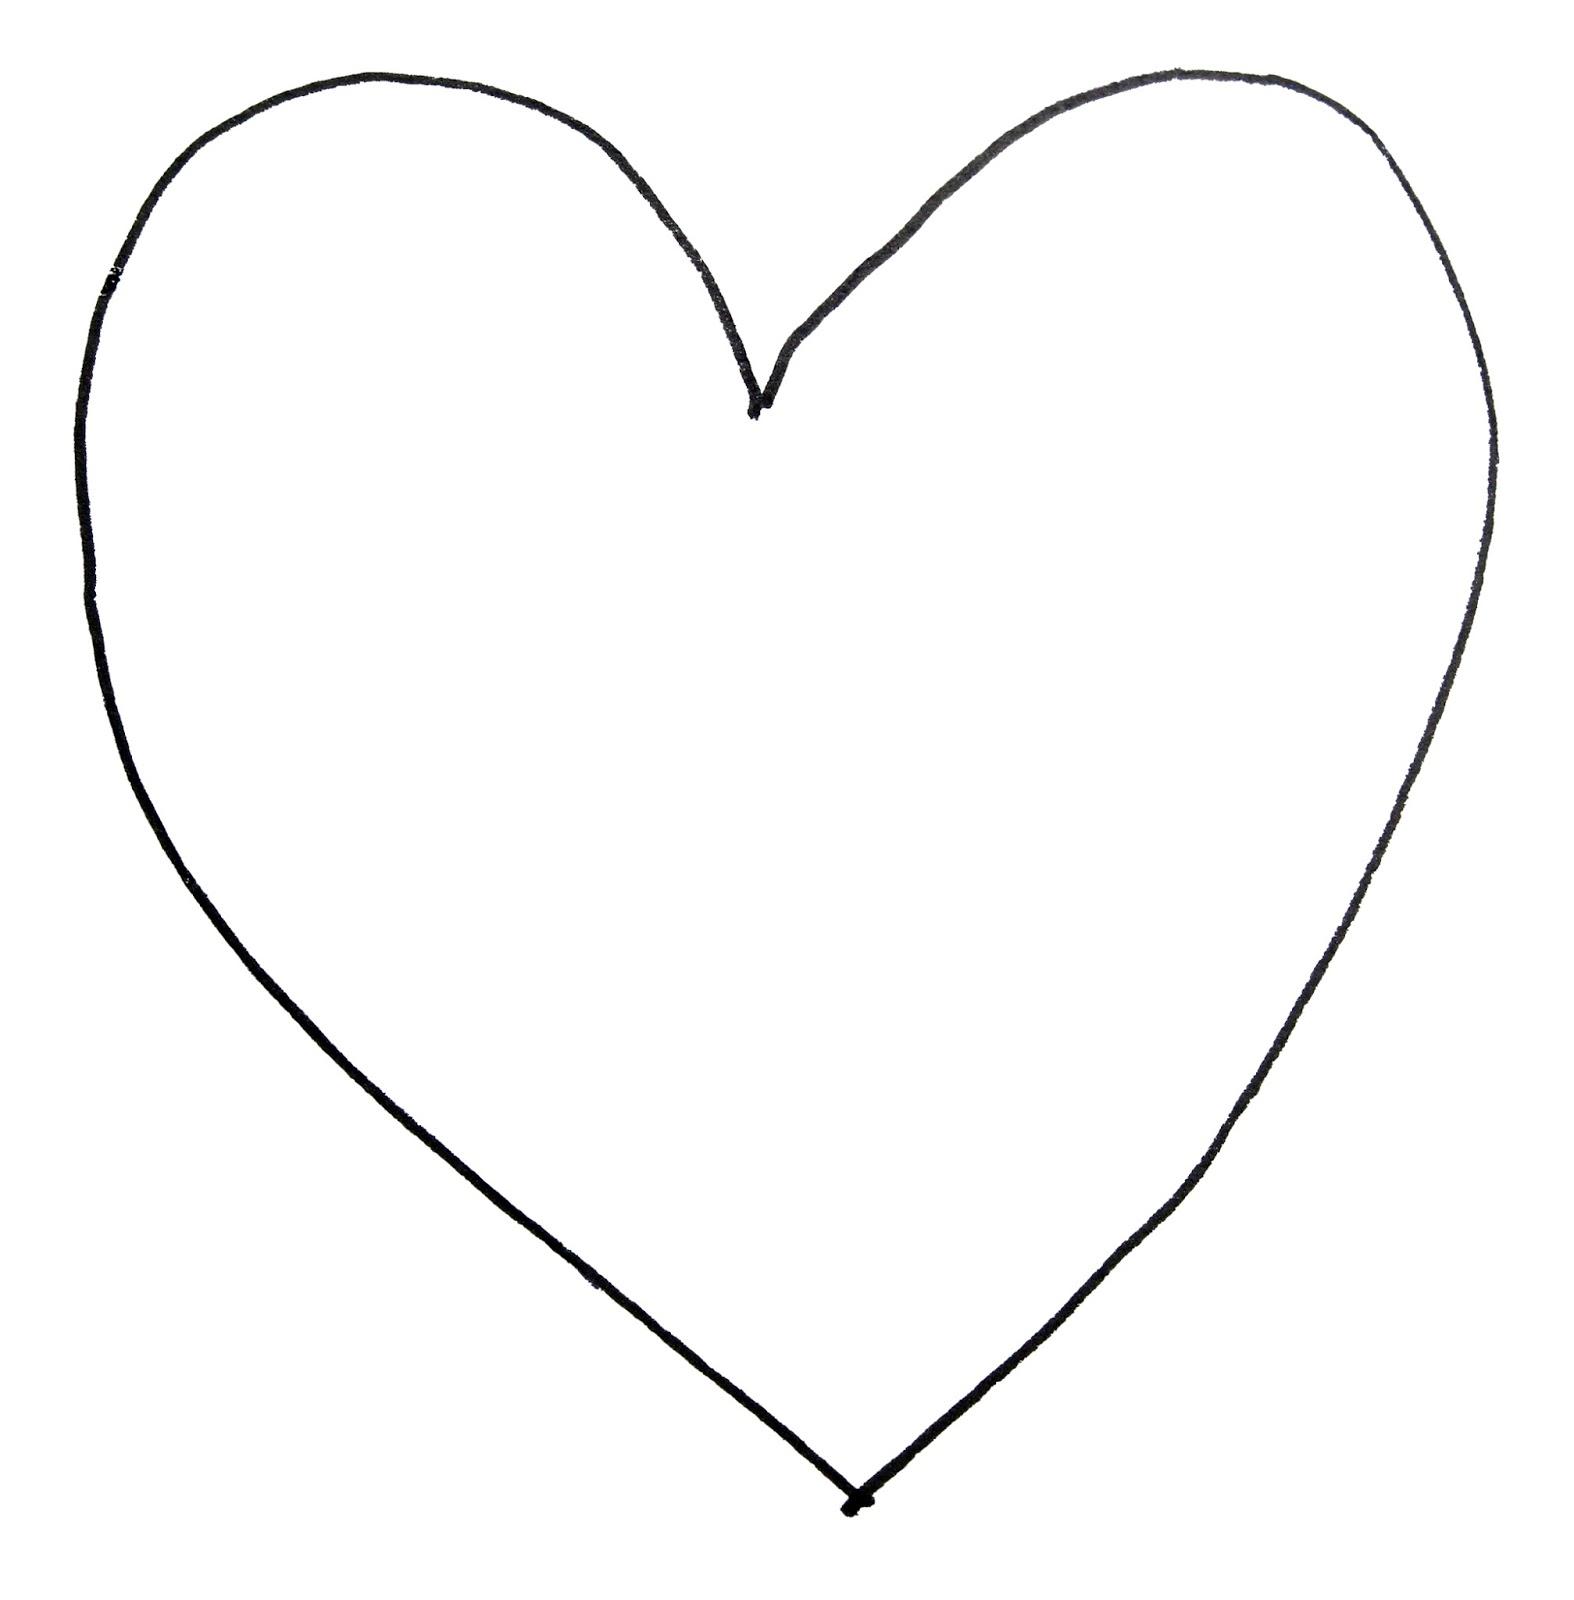 Hand drawn heart.